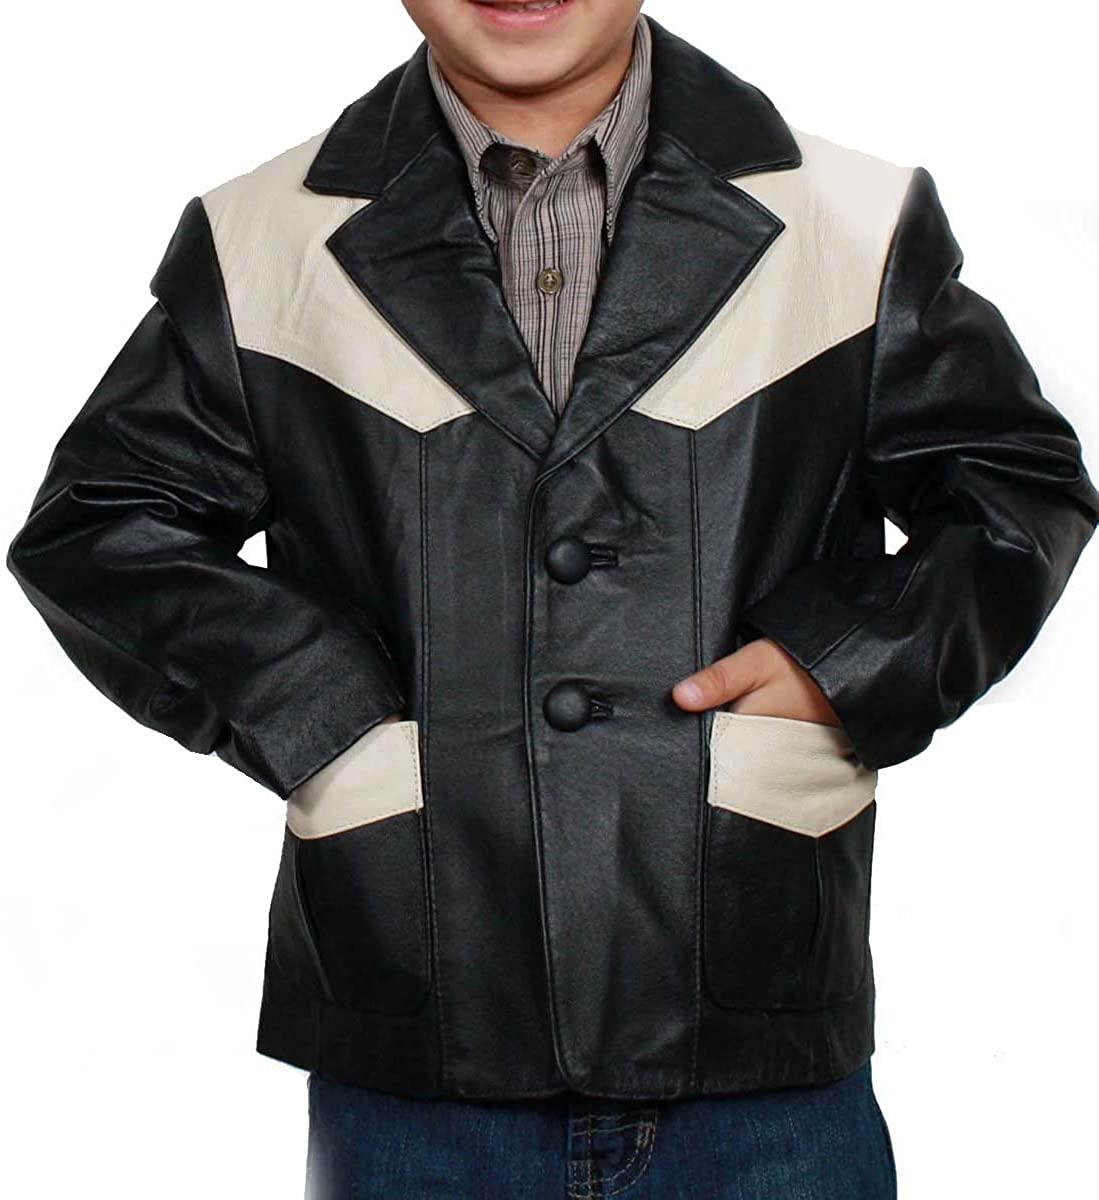 Kids Sports Blazer Western Style Black/Beige